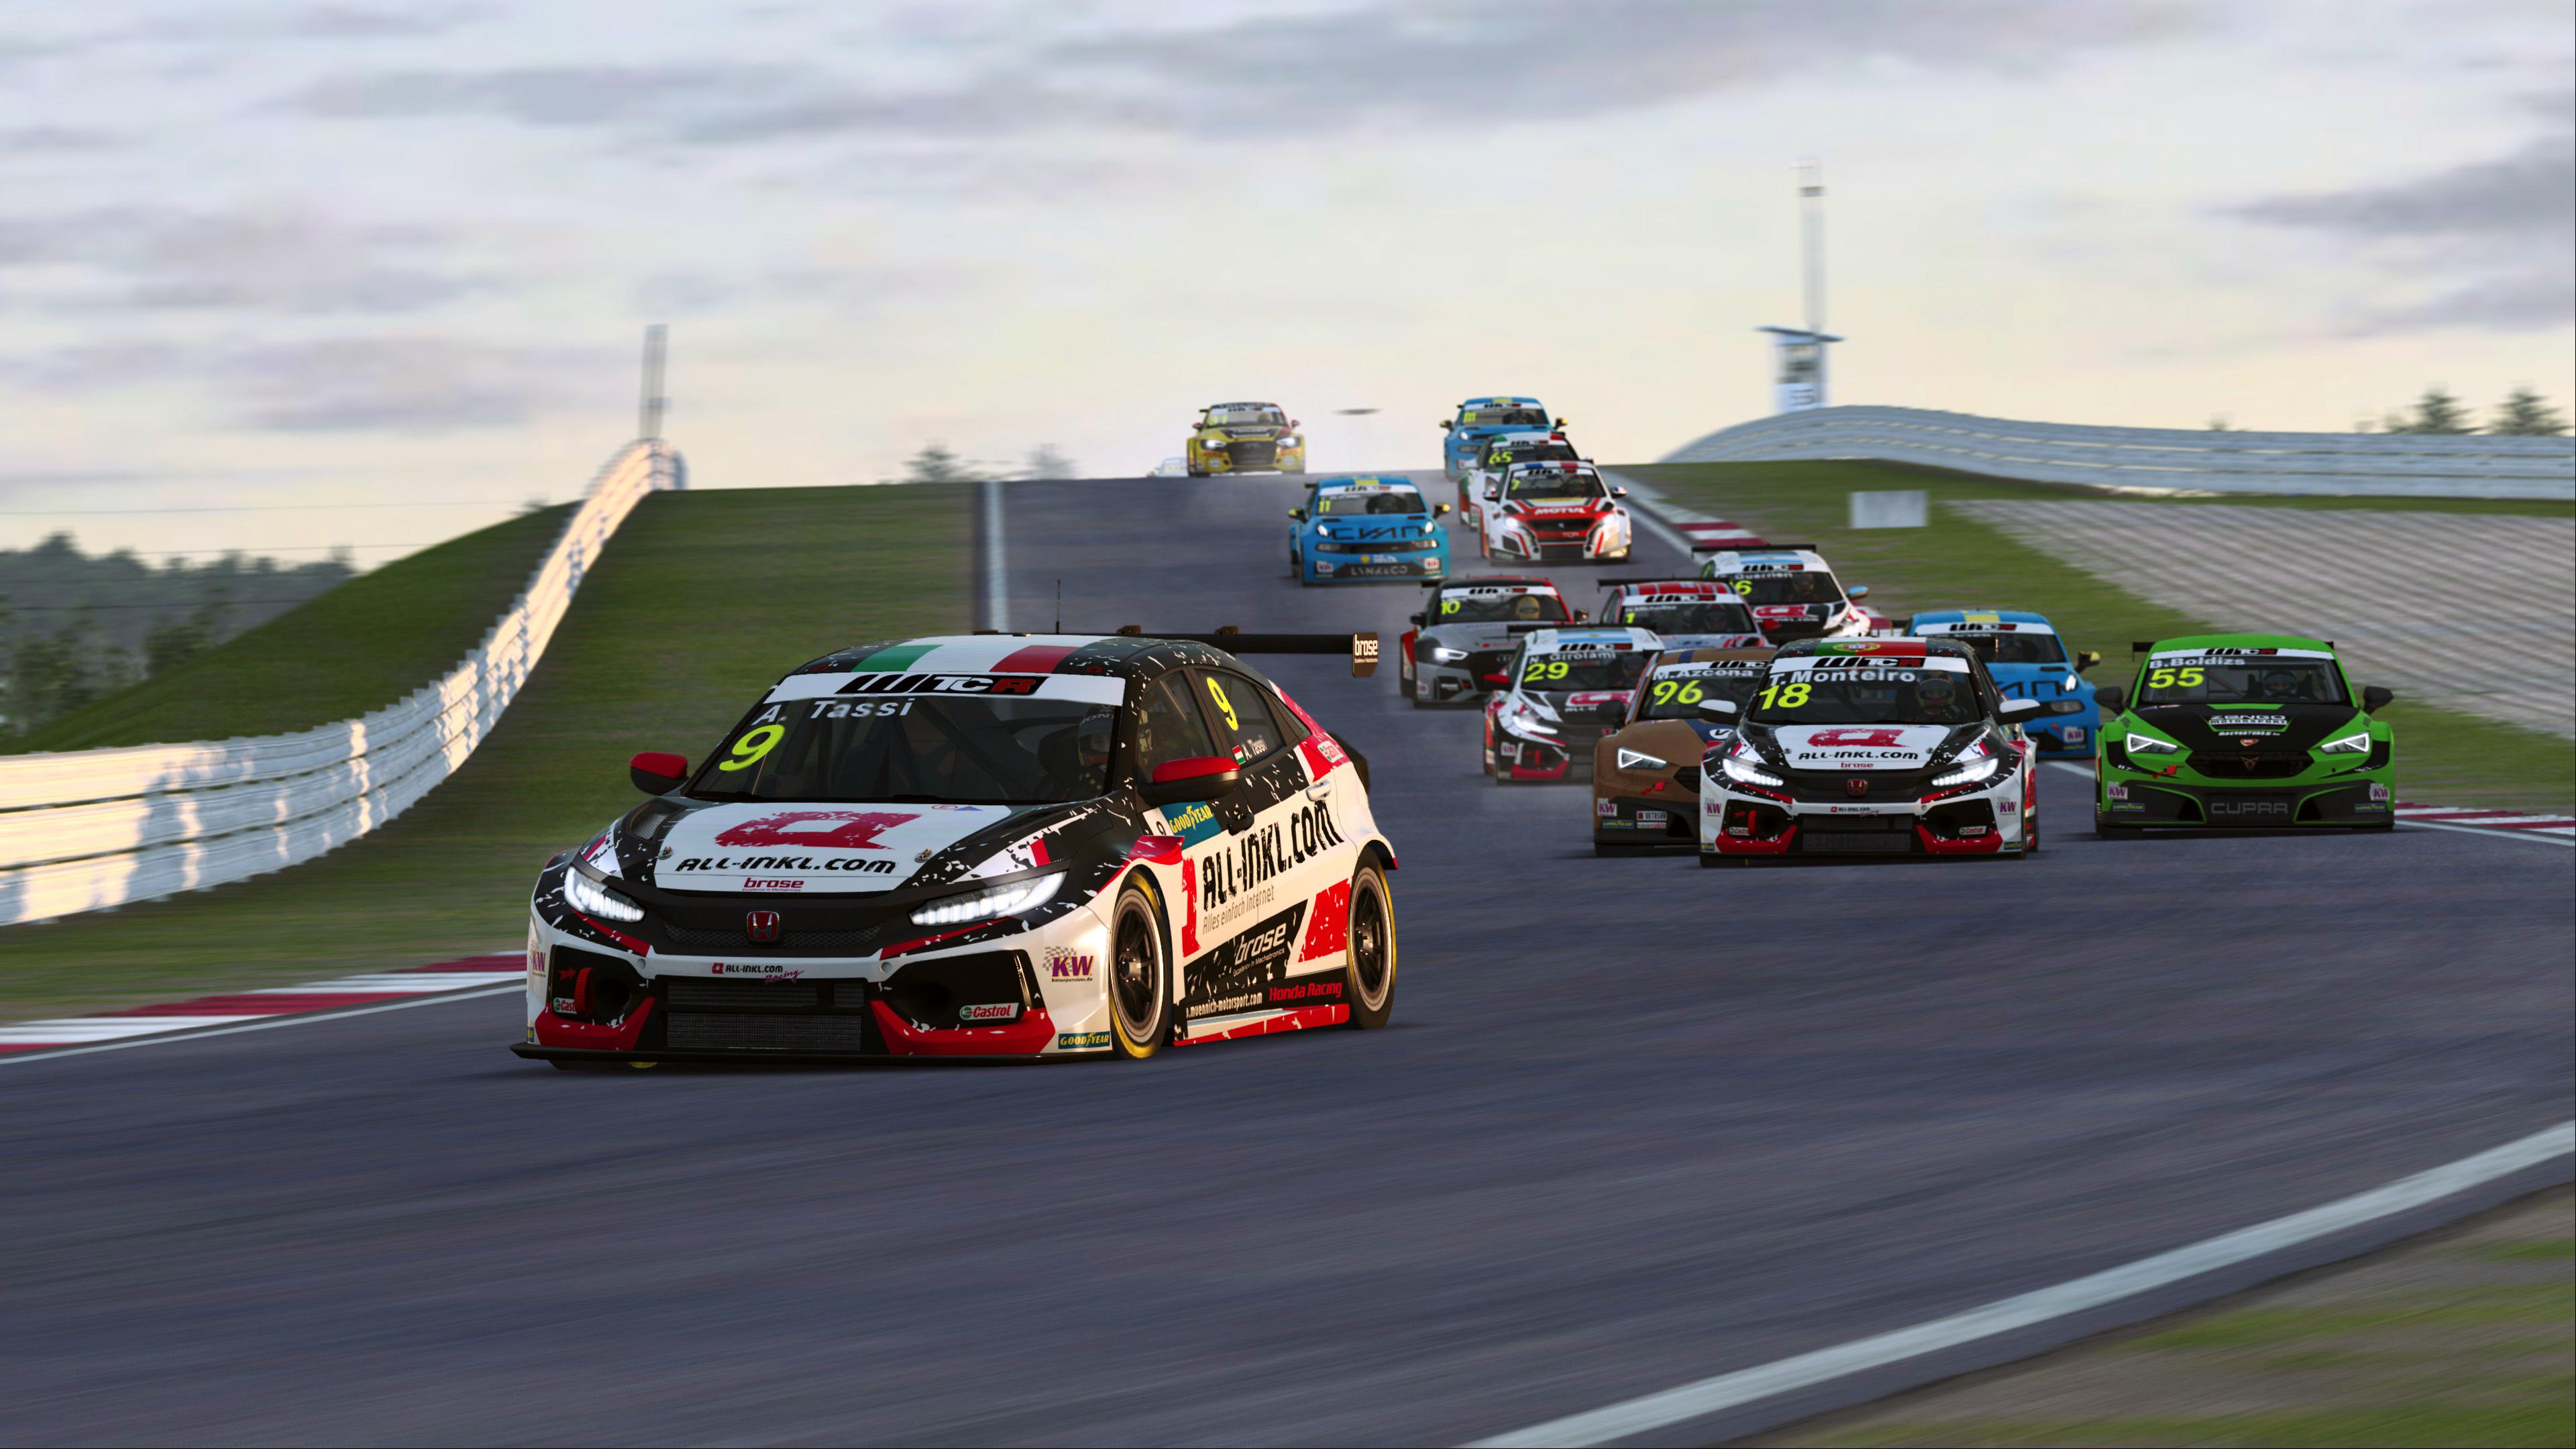 03-attila-tassi-leads-pre-season-wtcr-race-2.jpg